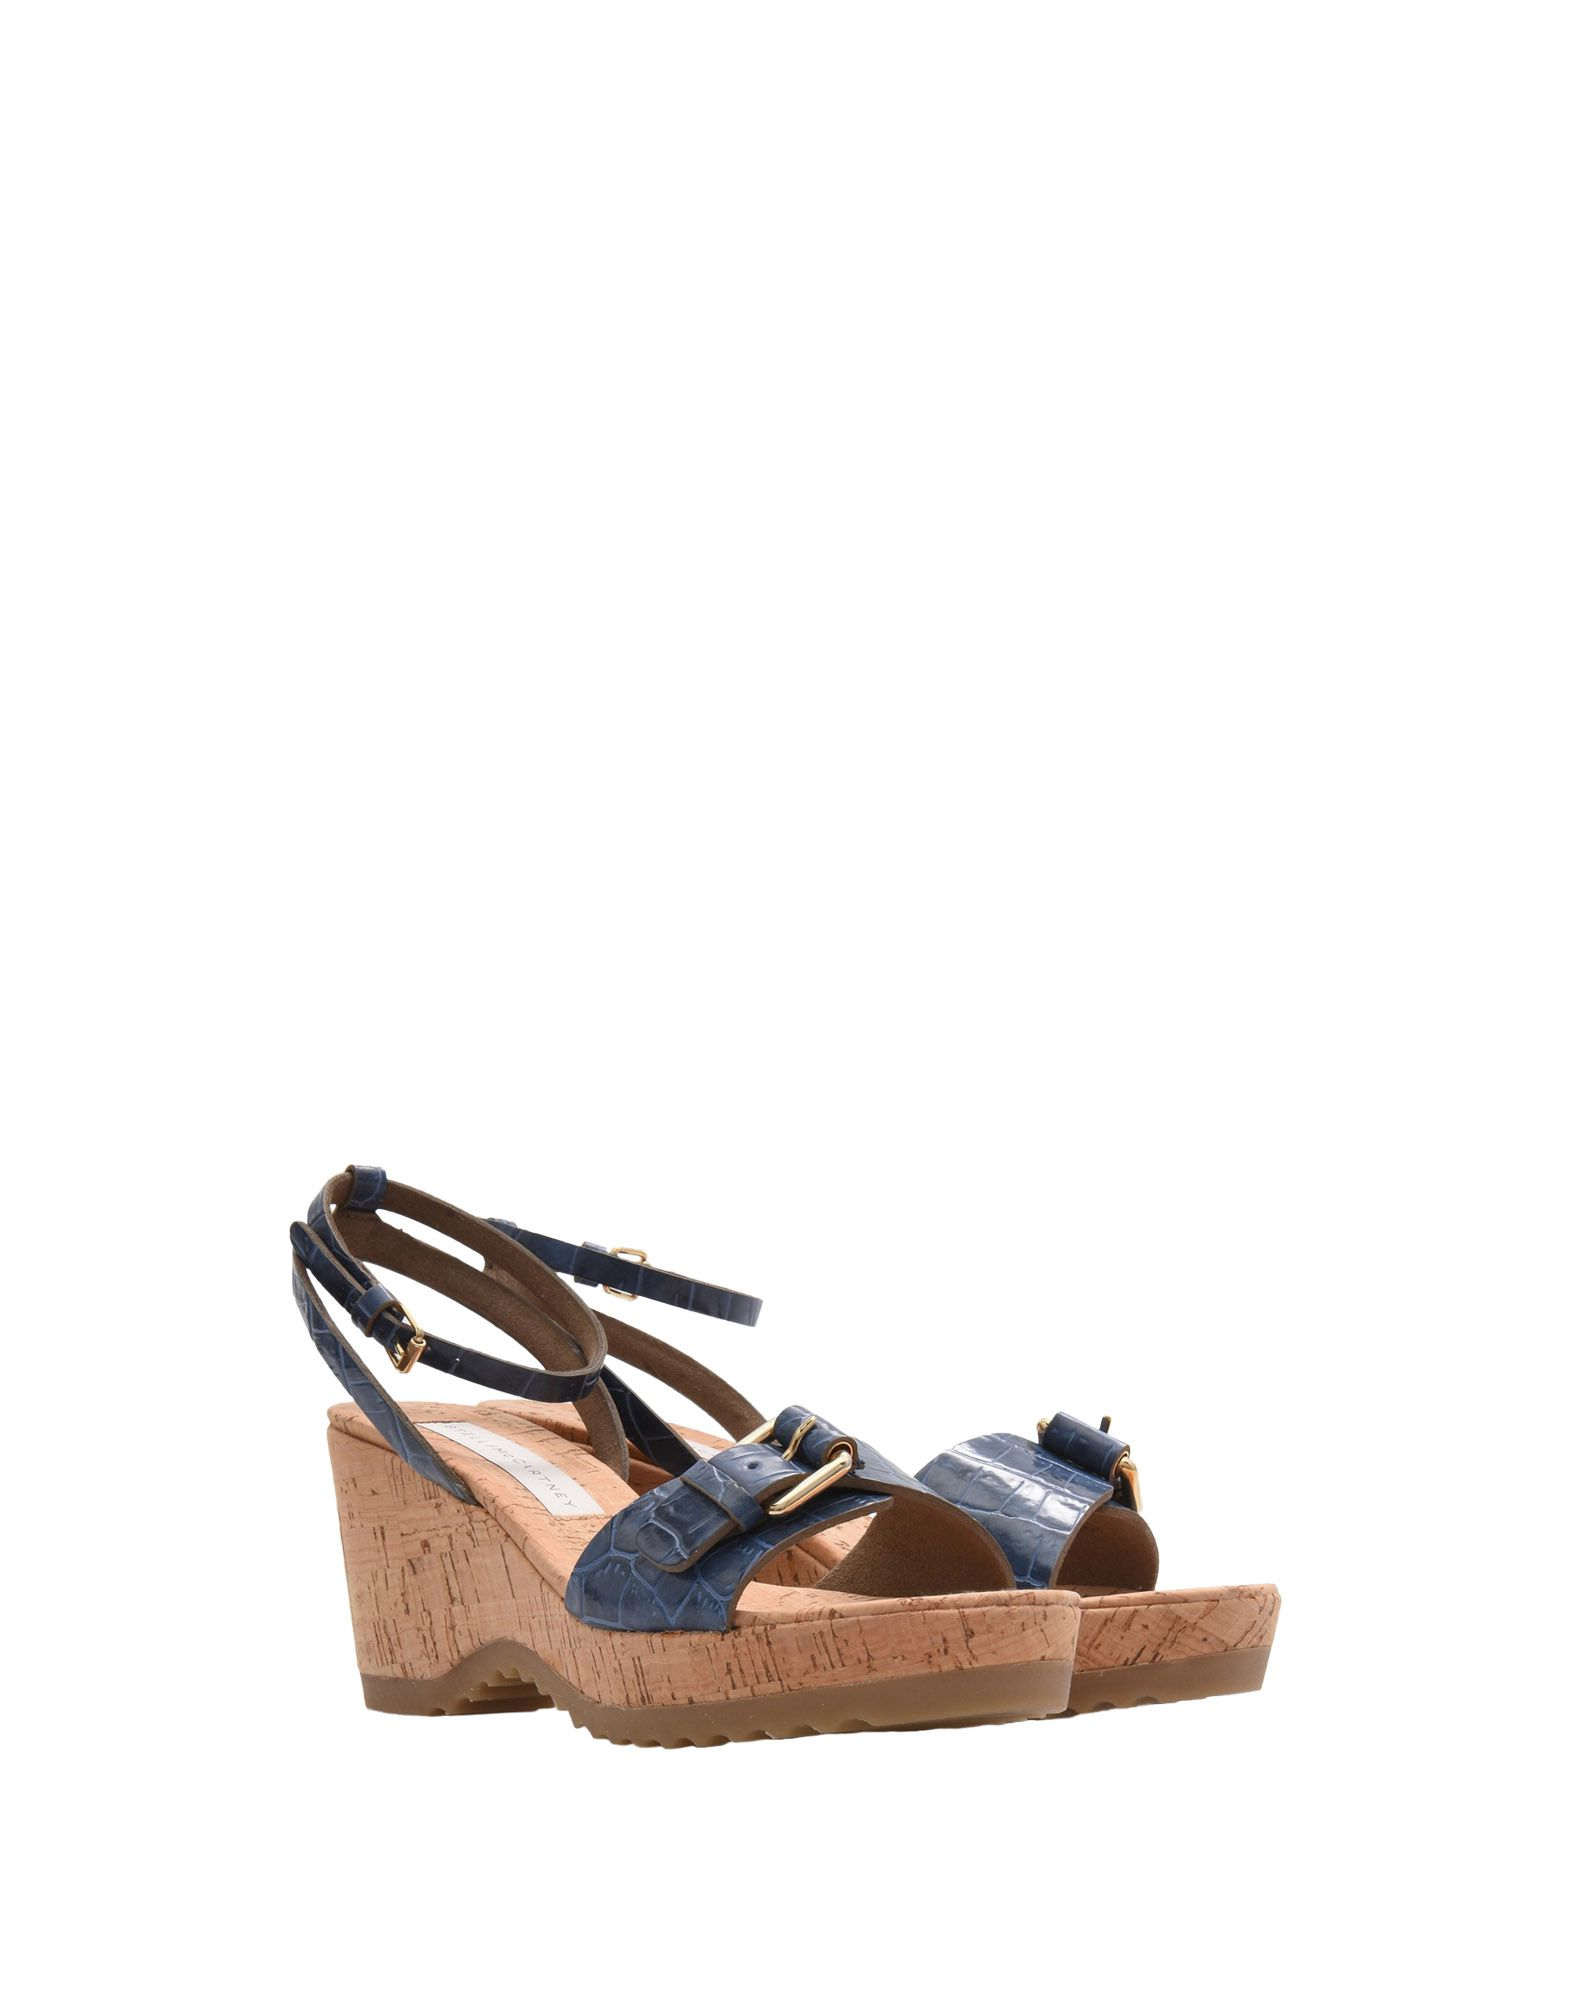 Stella Mccartney Sandalen 11478302IQ Damen  11478302IQ Sandalen Neue Schuhe a74df7